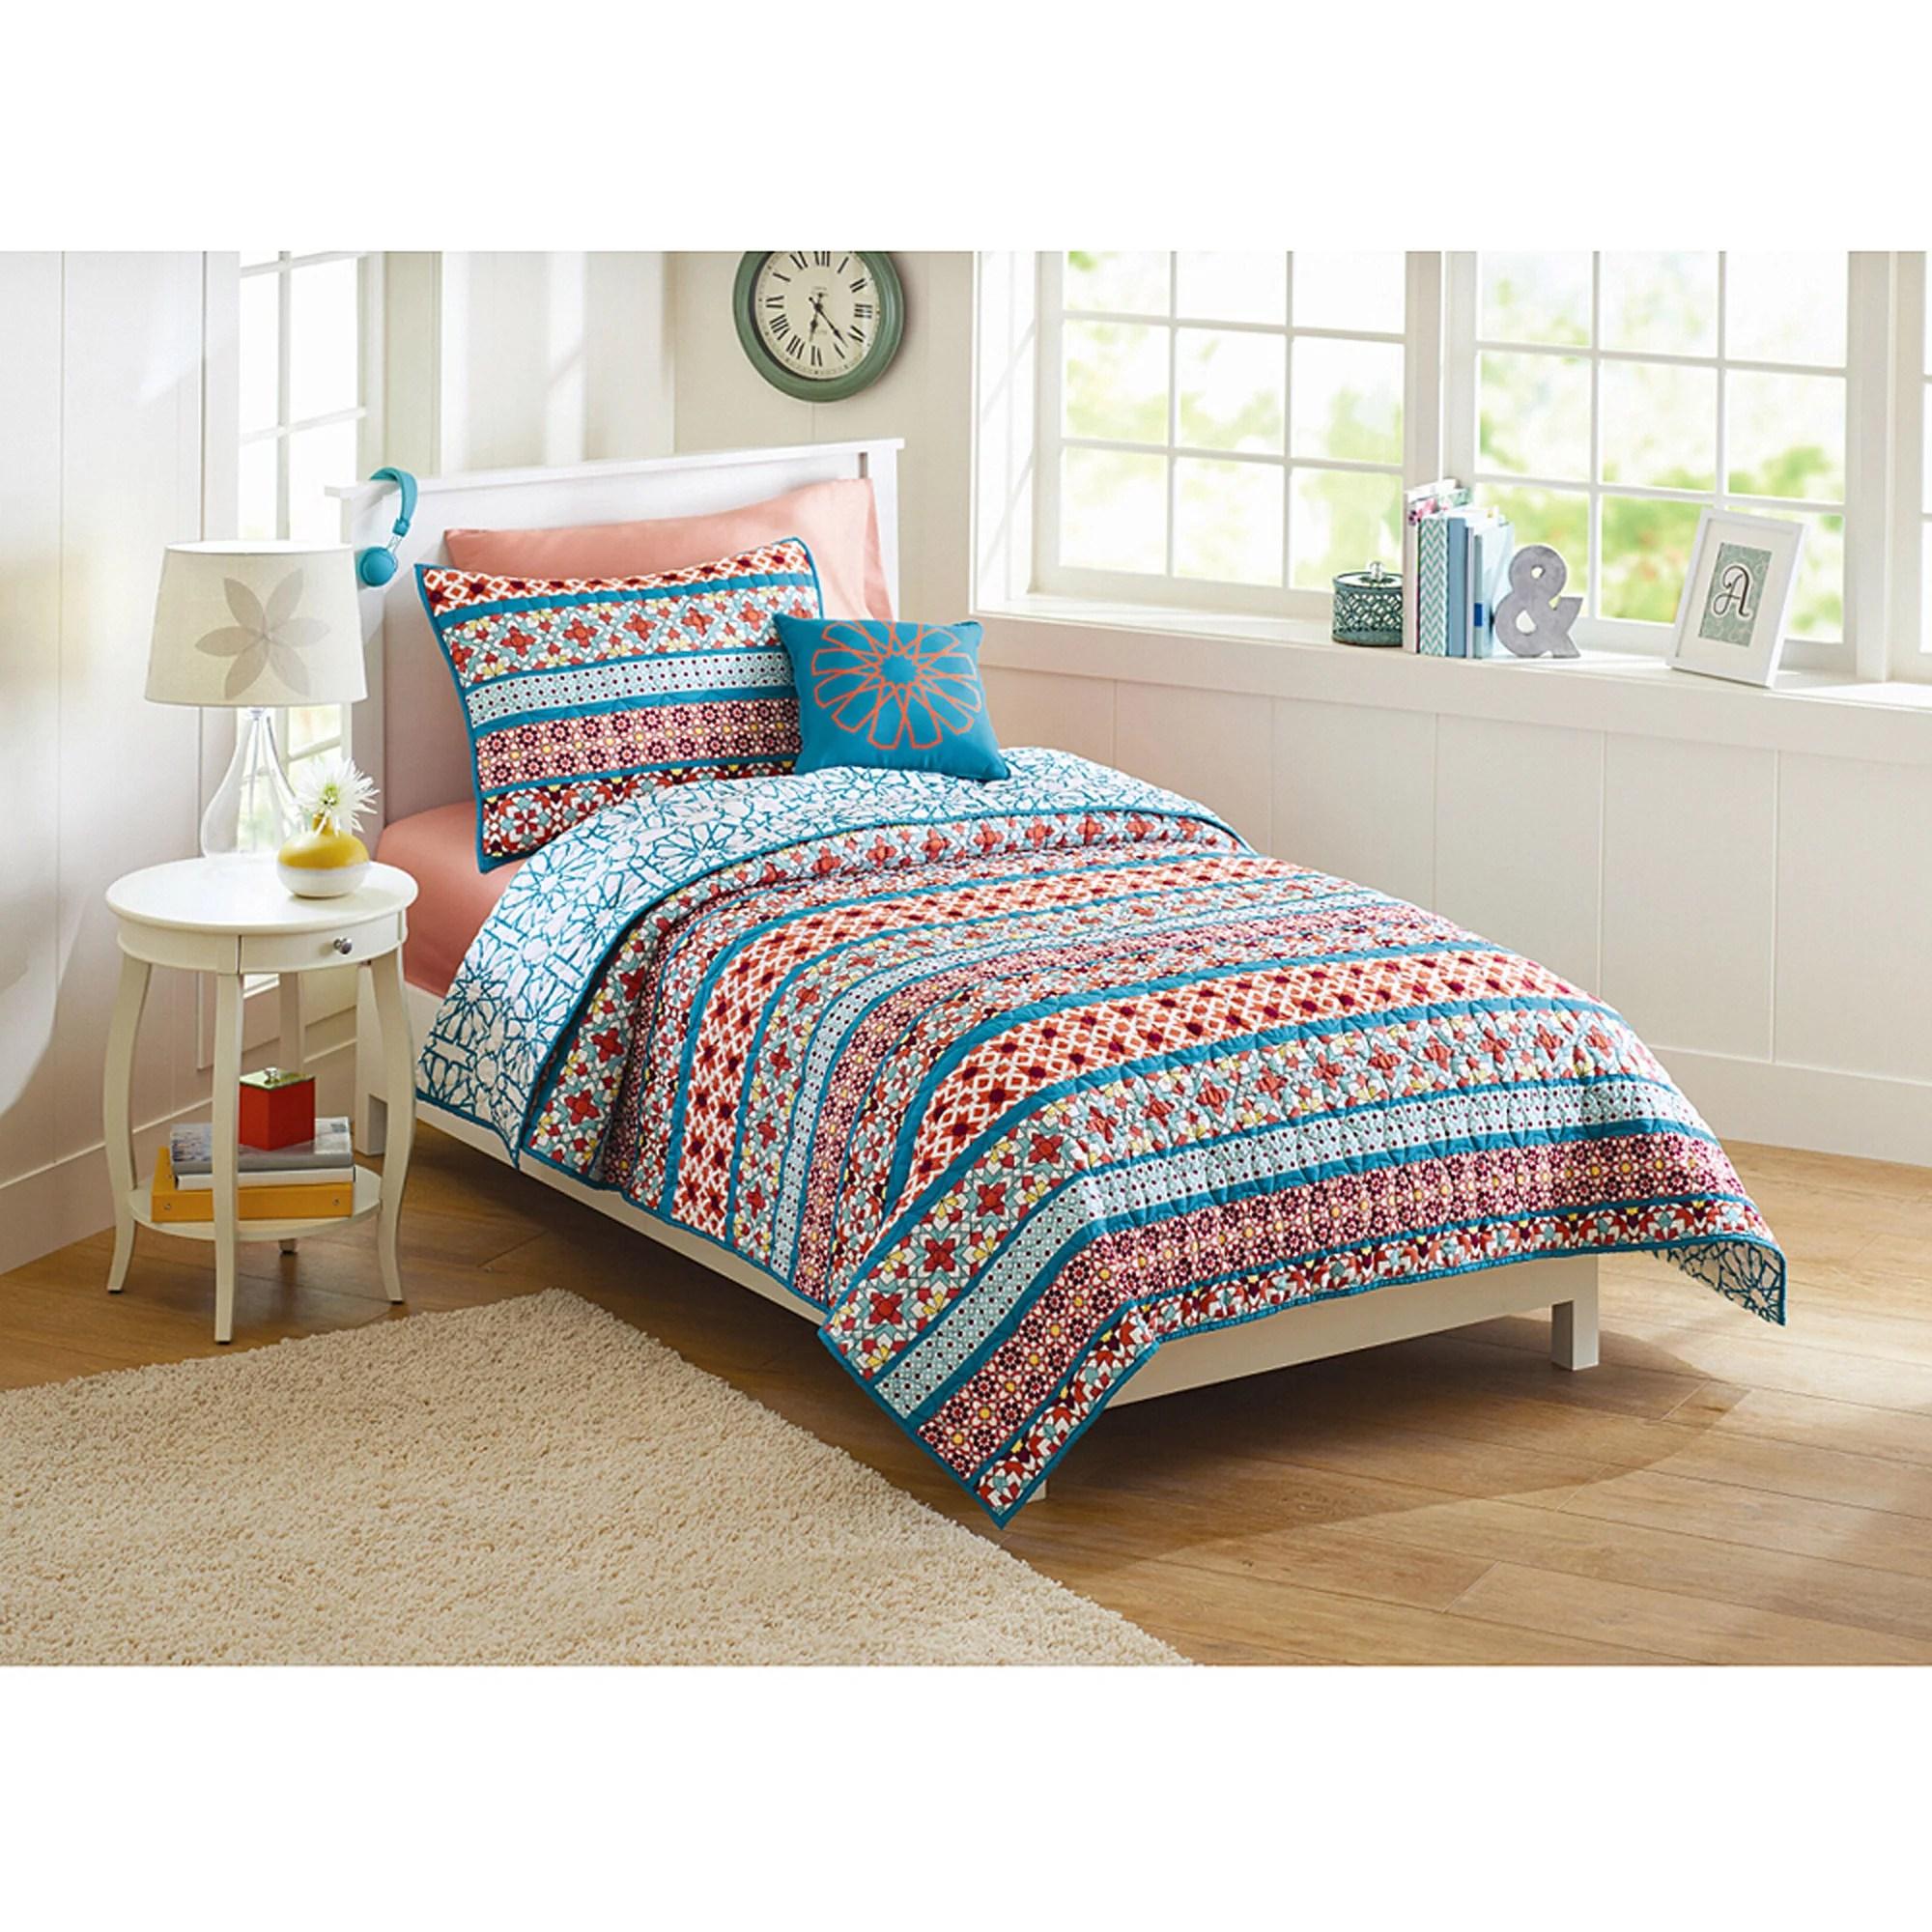 Better Homes and Gardens Turkish Medallion Quilt Bedding